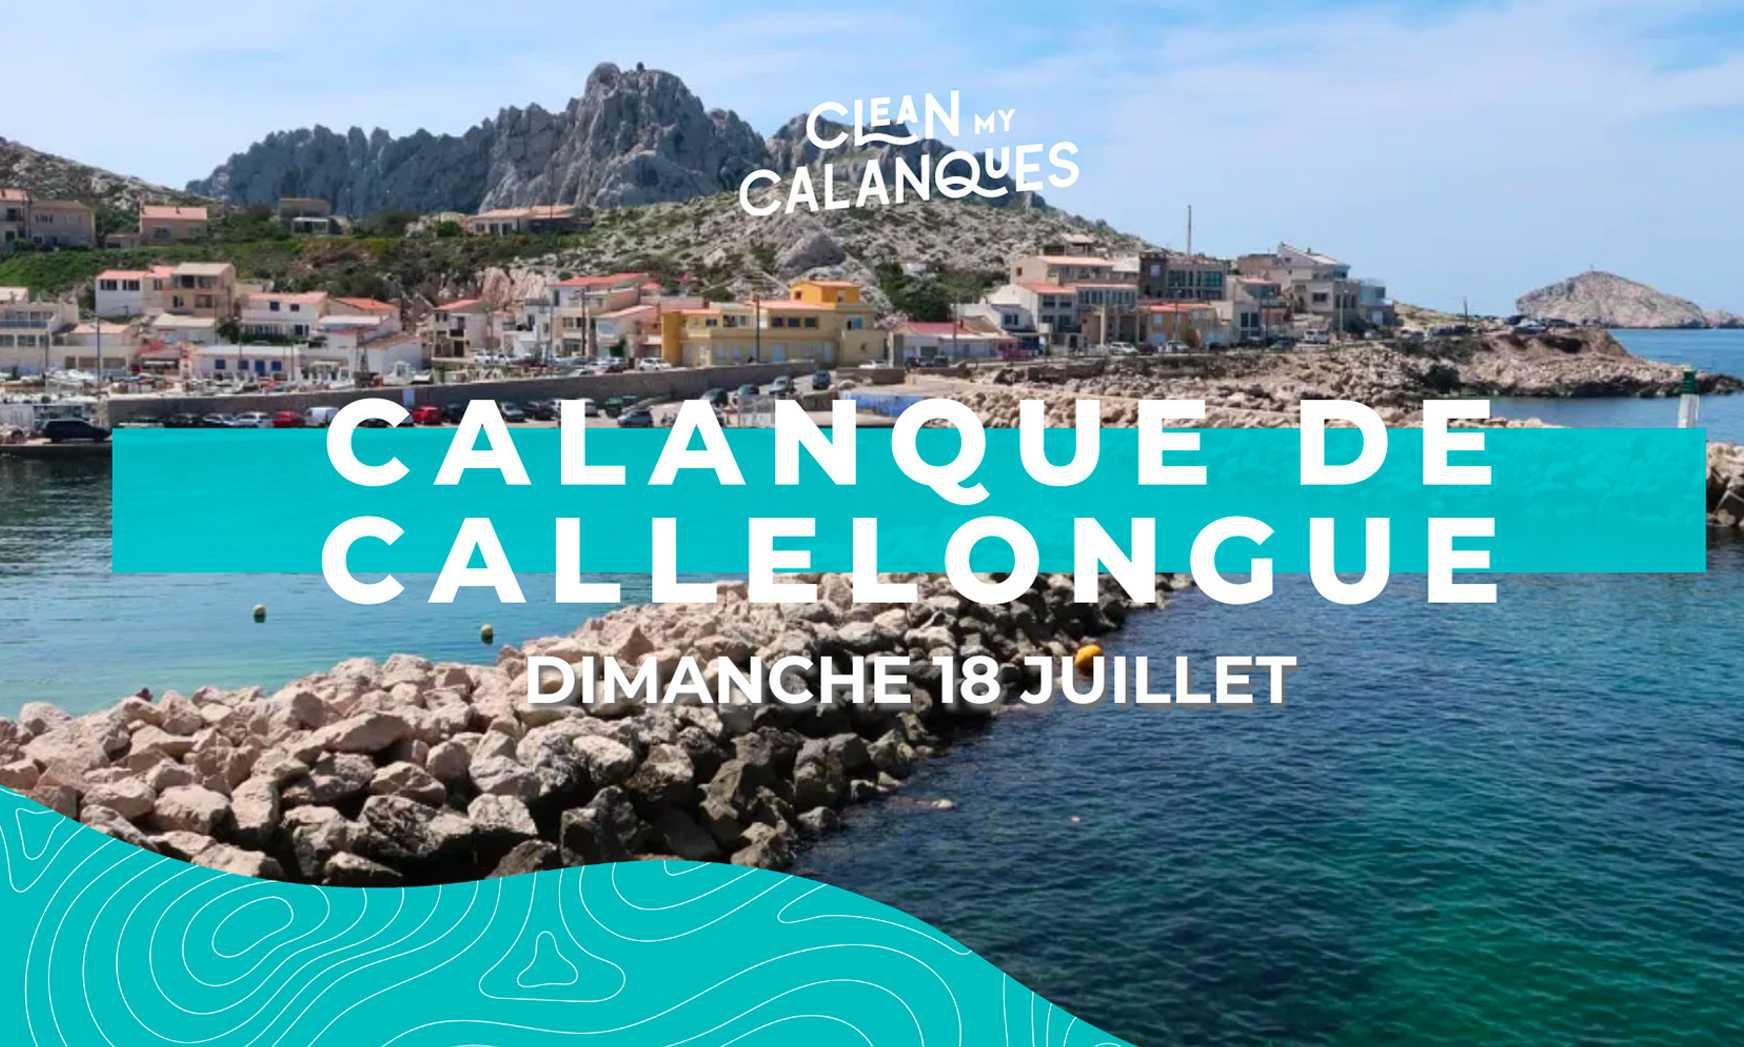 Image [À VENIR] Retour à Callelongue (#35)